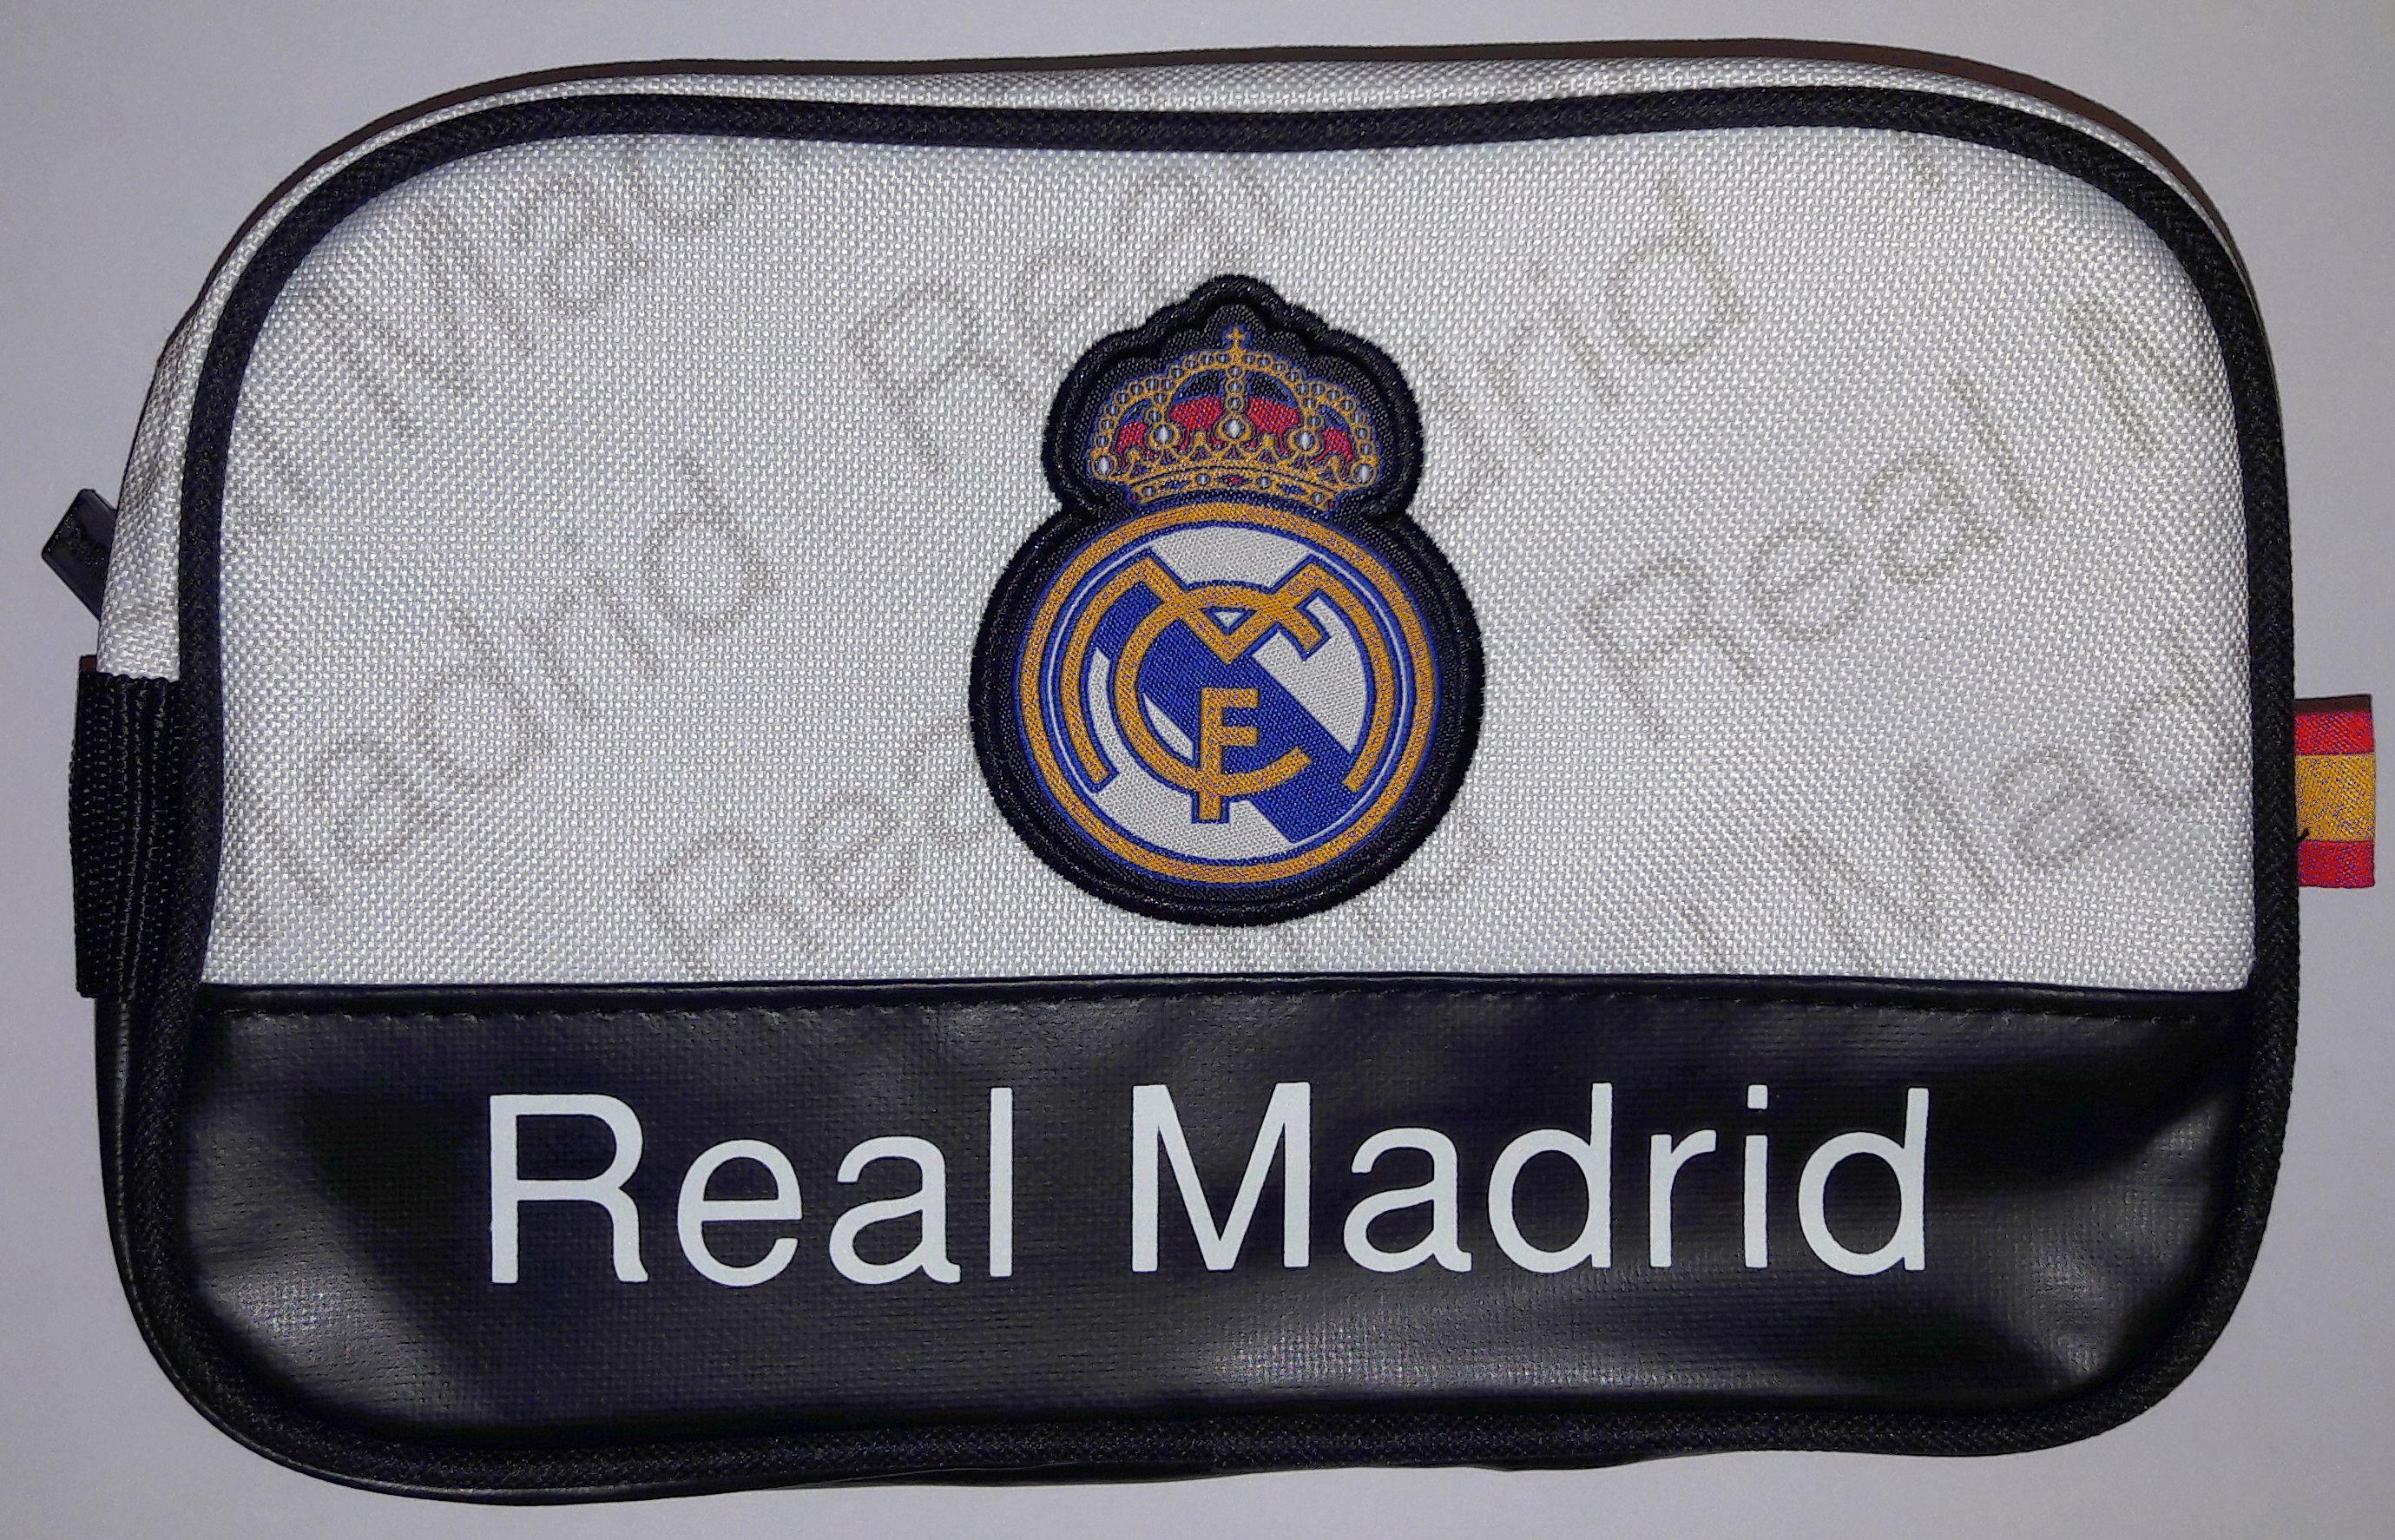 88ed5589da86 Real Madrid neszeszer táska - Real Madrid